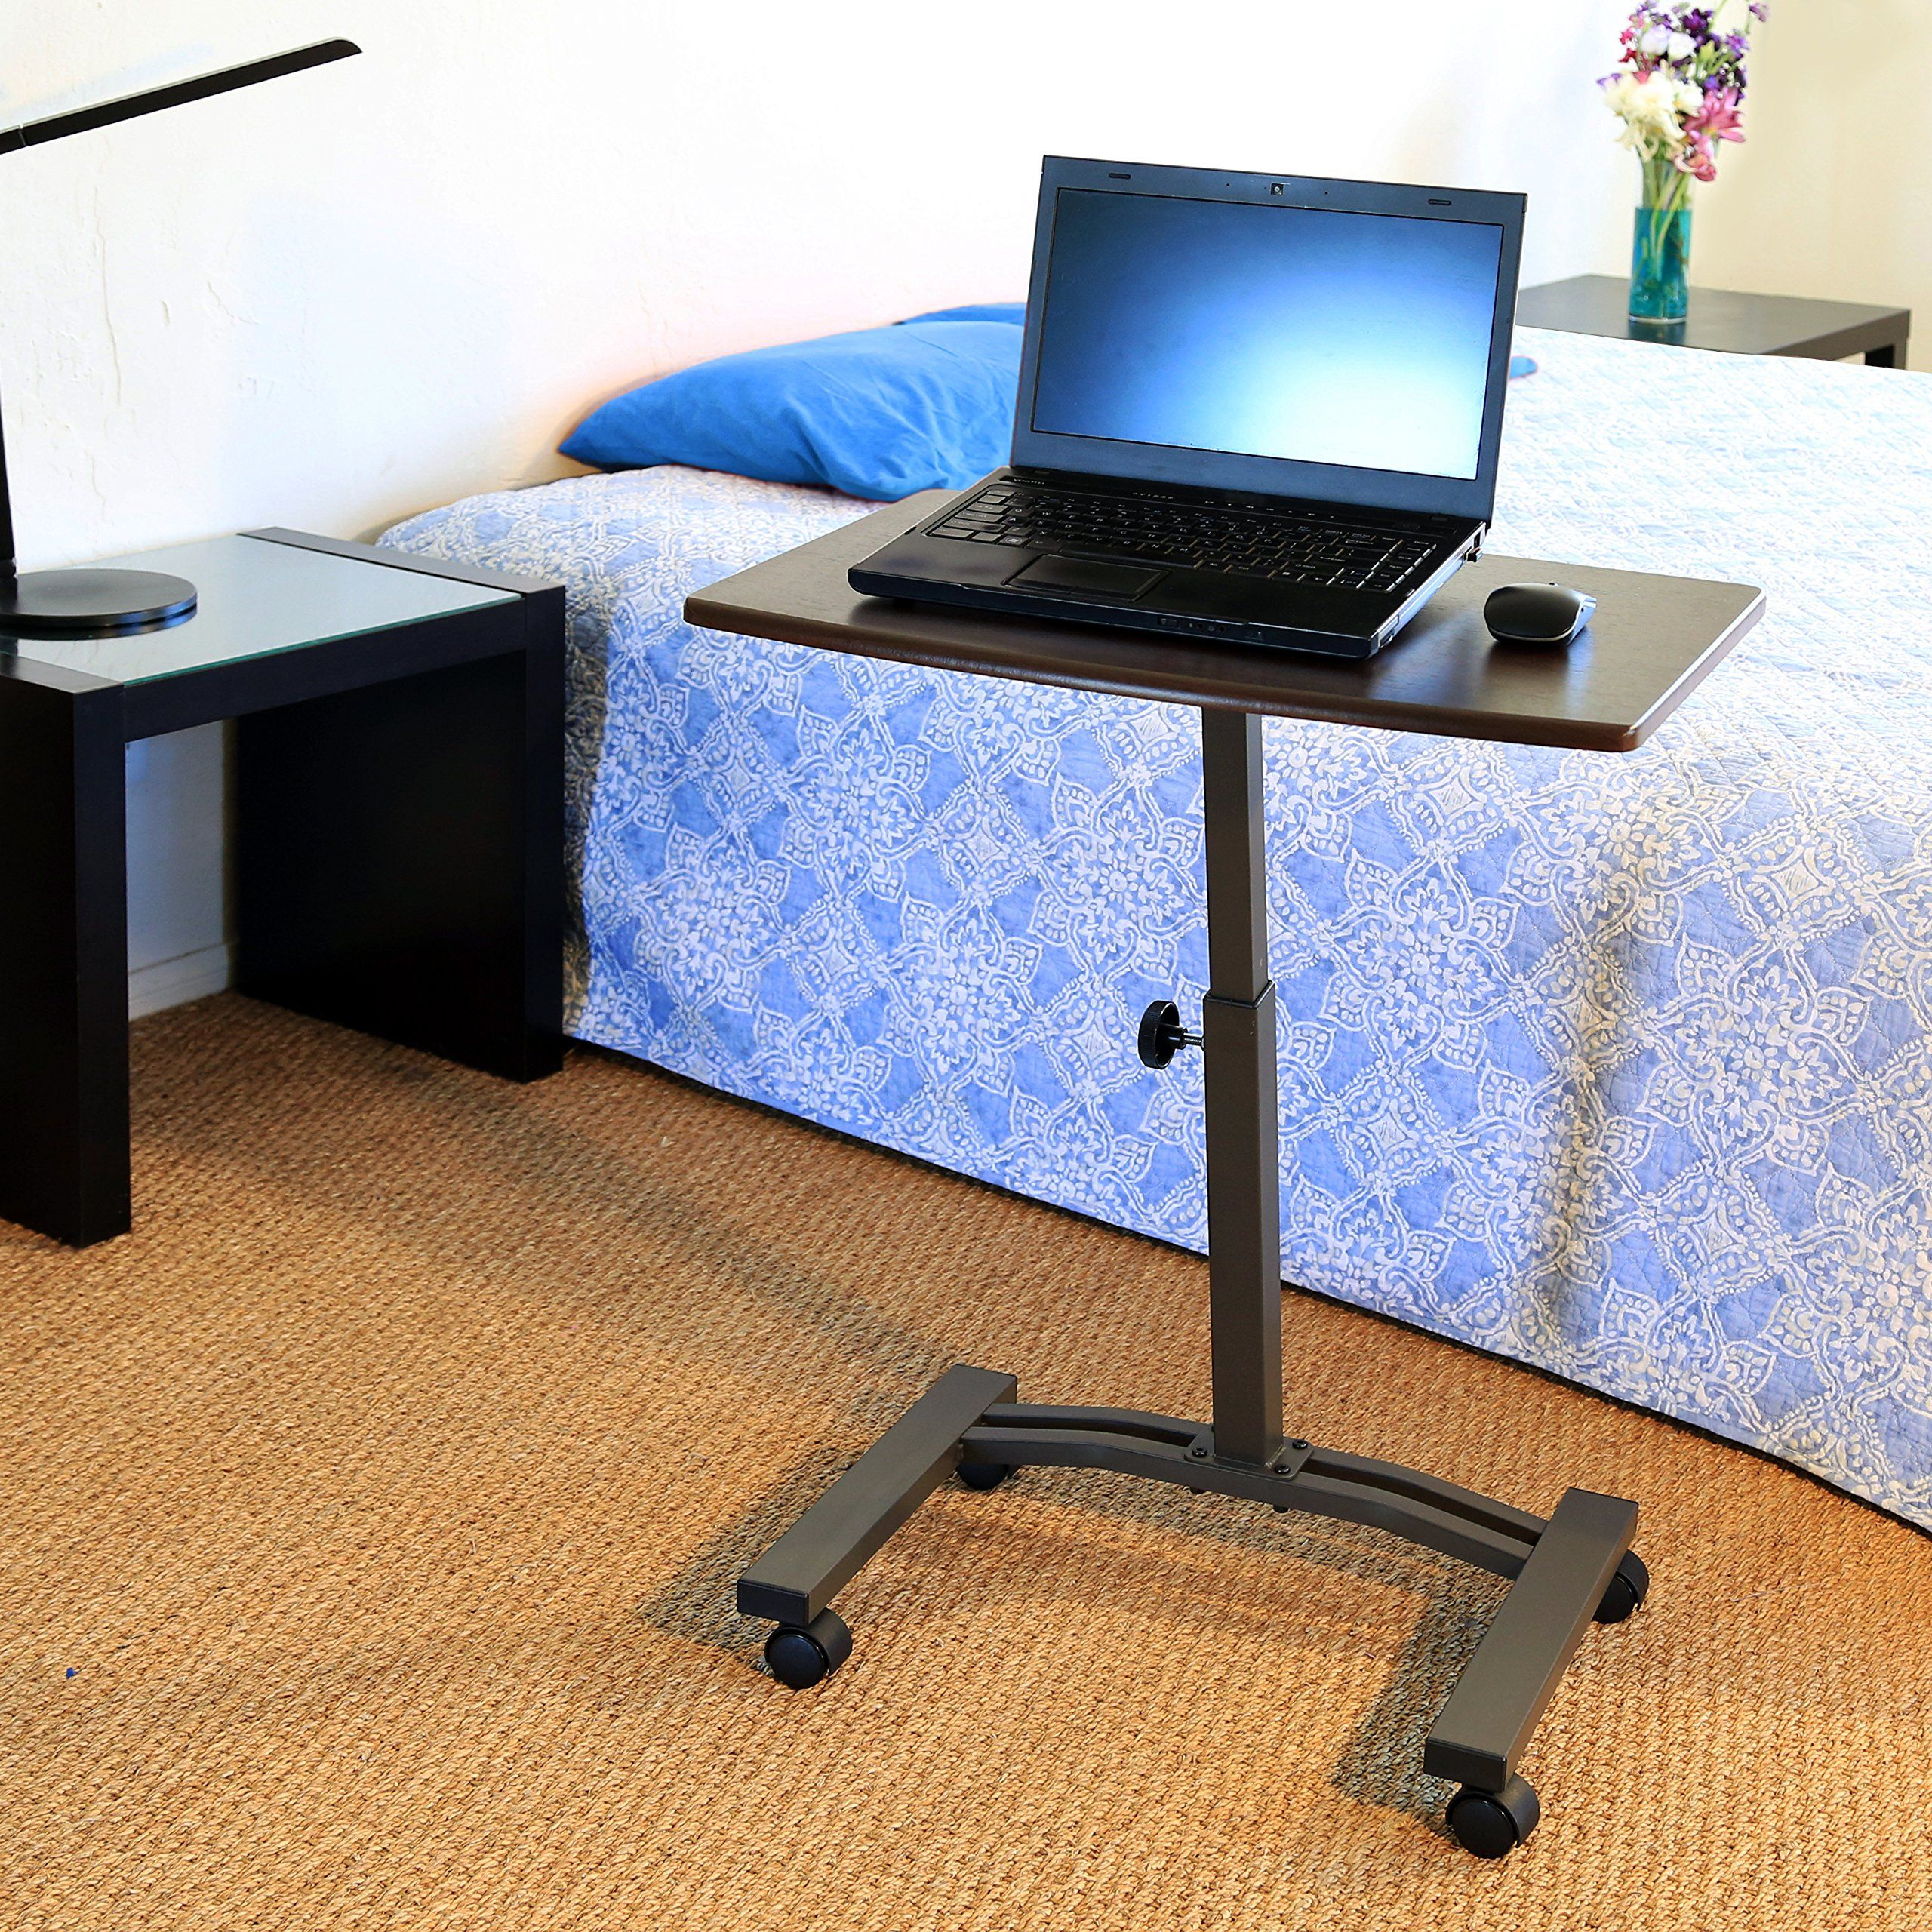 Amazon.com - Seville Classics Mobile Laptop Desk Cart - Notebook Computer  Stands | Ev ofisi, Ofisler, Evler